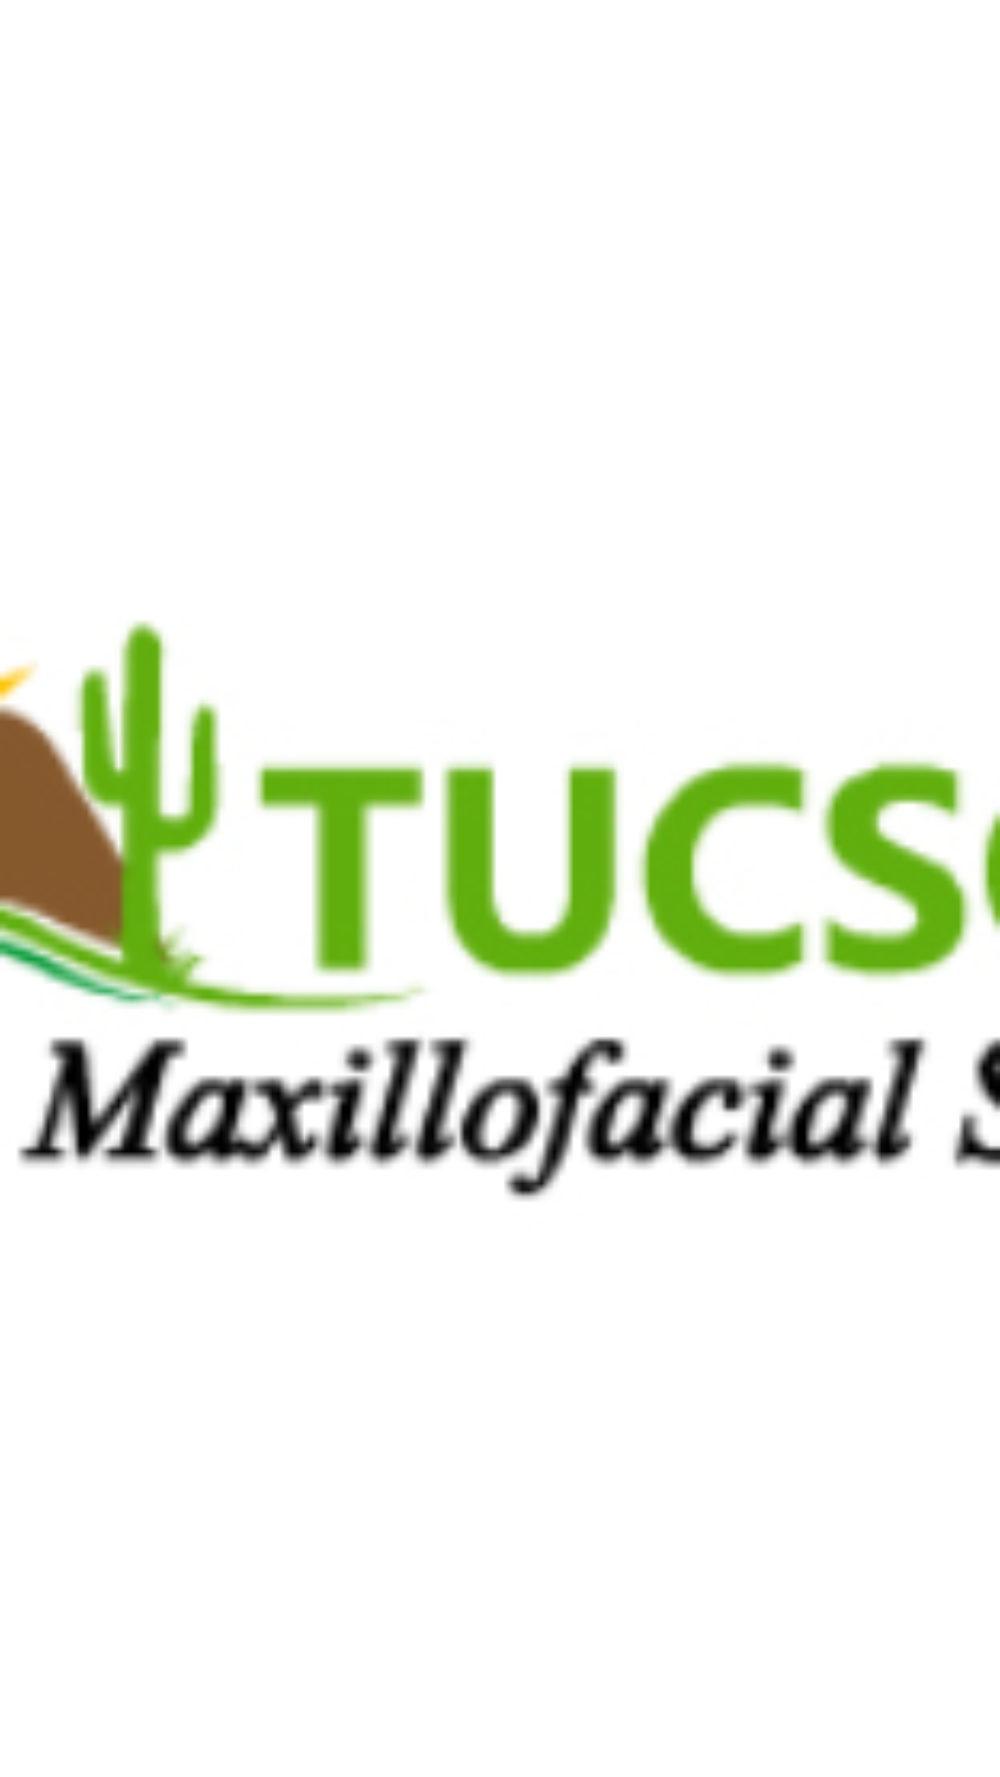 Arizona-tucson-logo